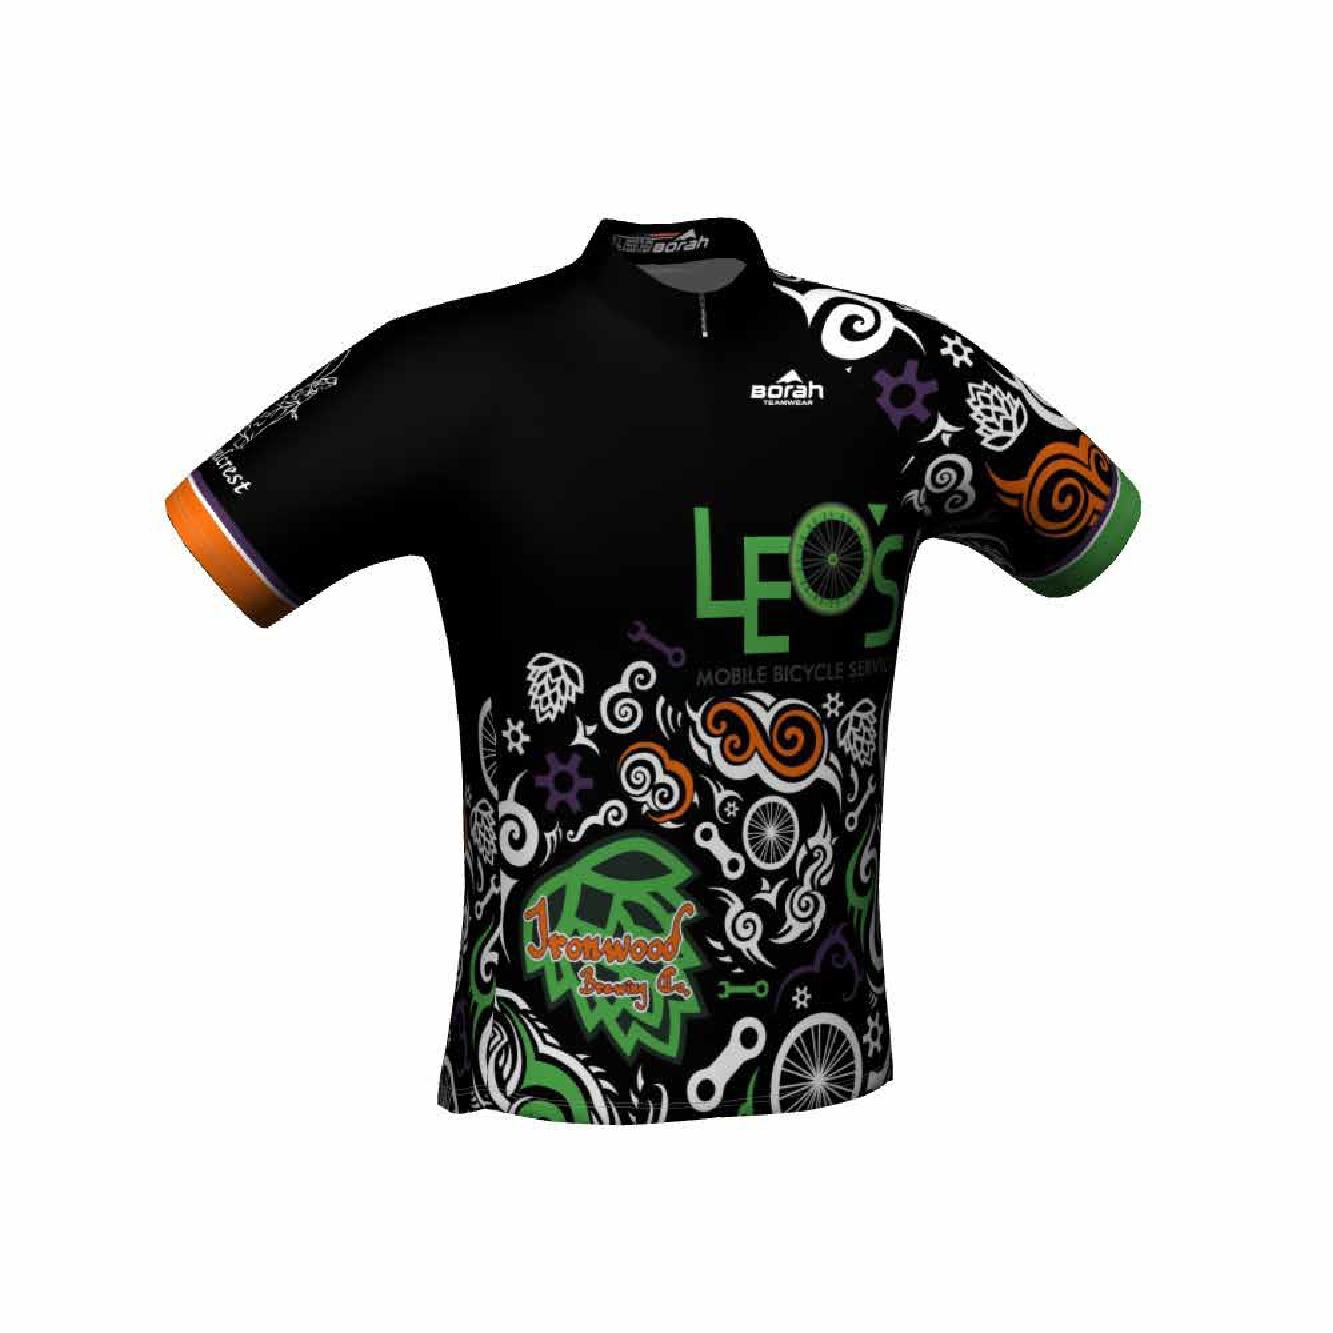 Leo's Bicycling Shirt